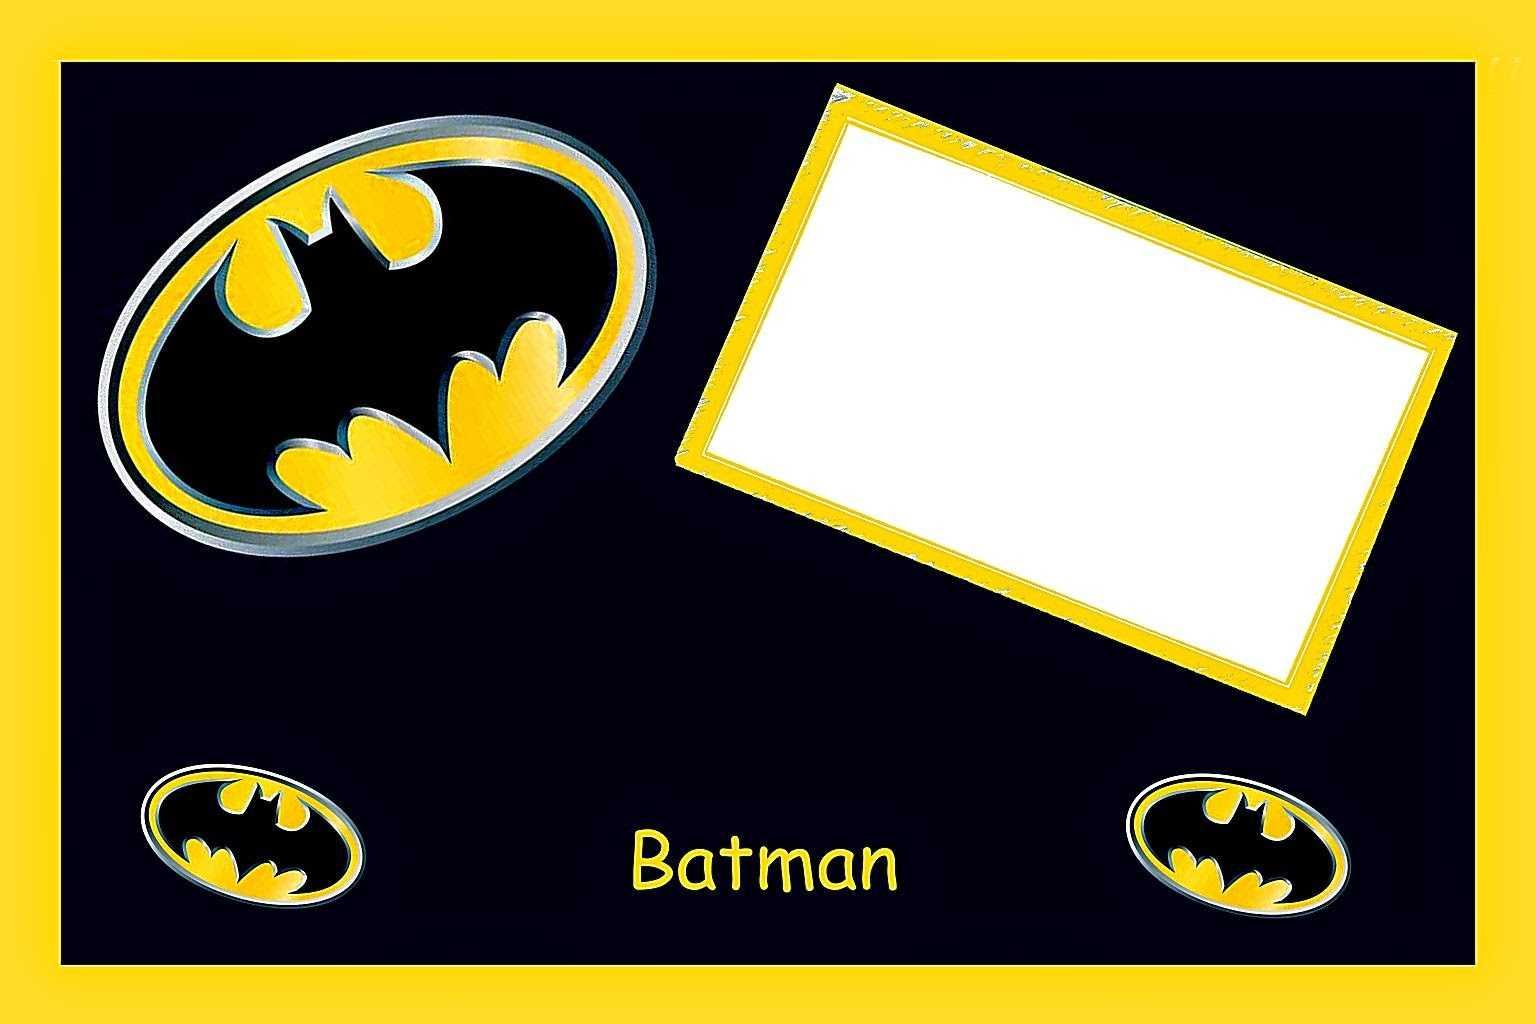 Batman Birthday: Free Printable Cards Or Invitations. - Oh Regarding Batman Birthday Card Template